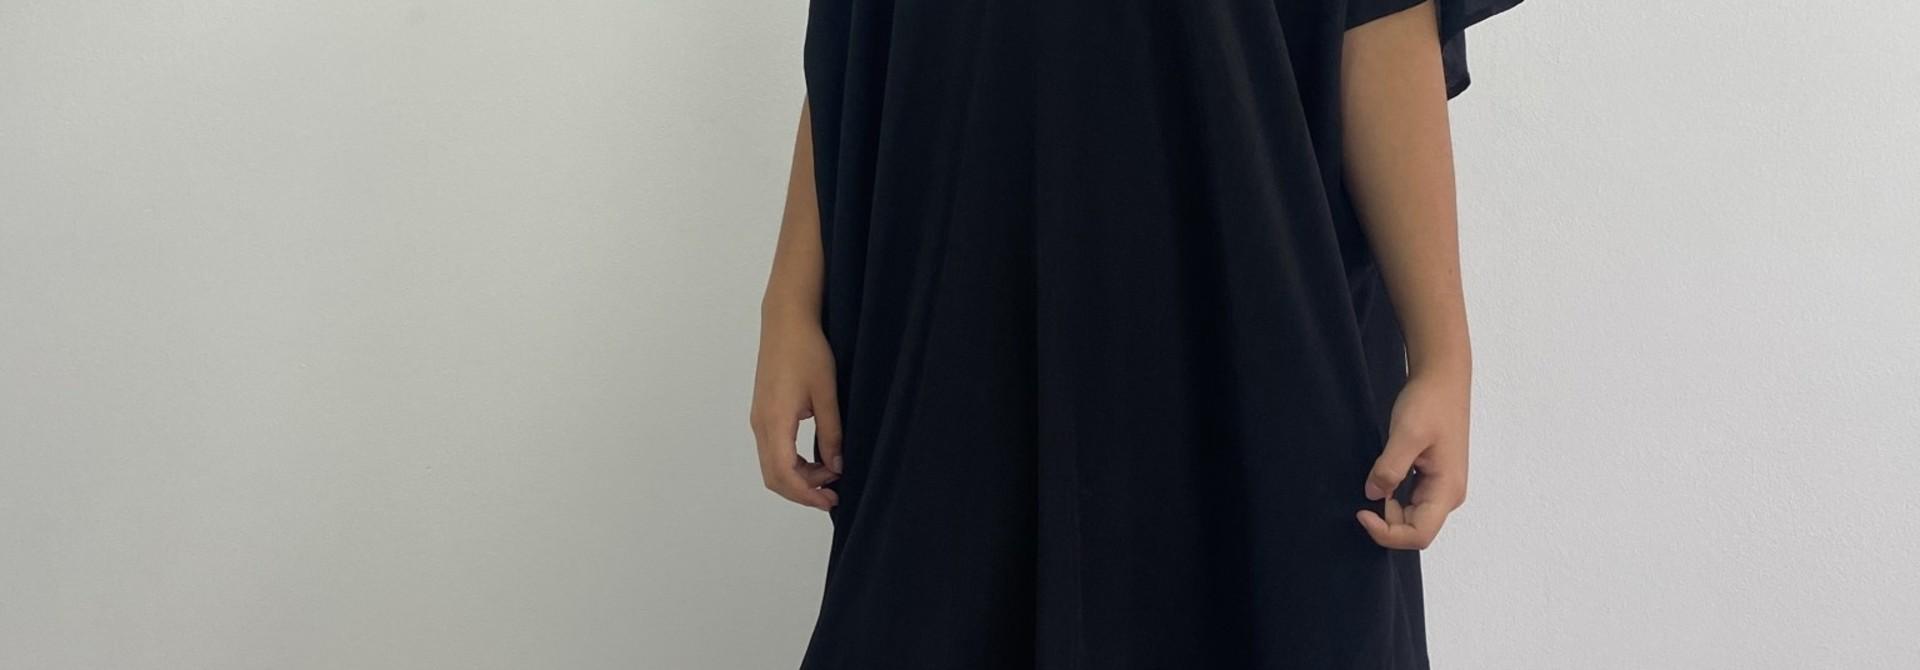 Seline tunic dress Black